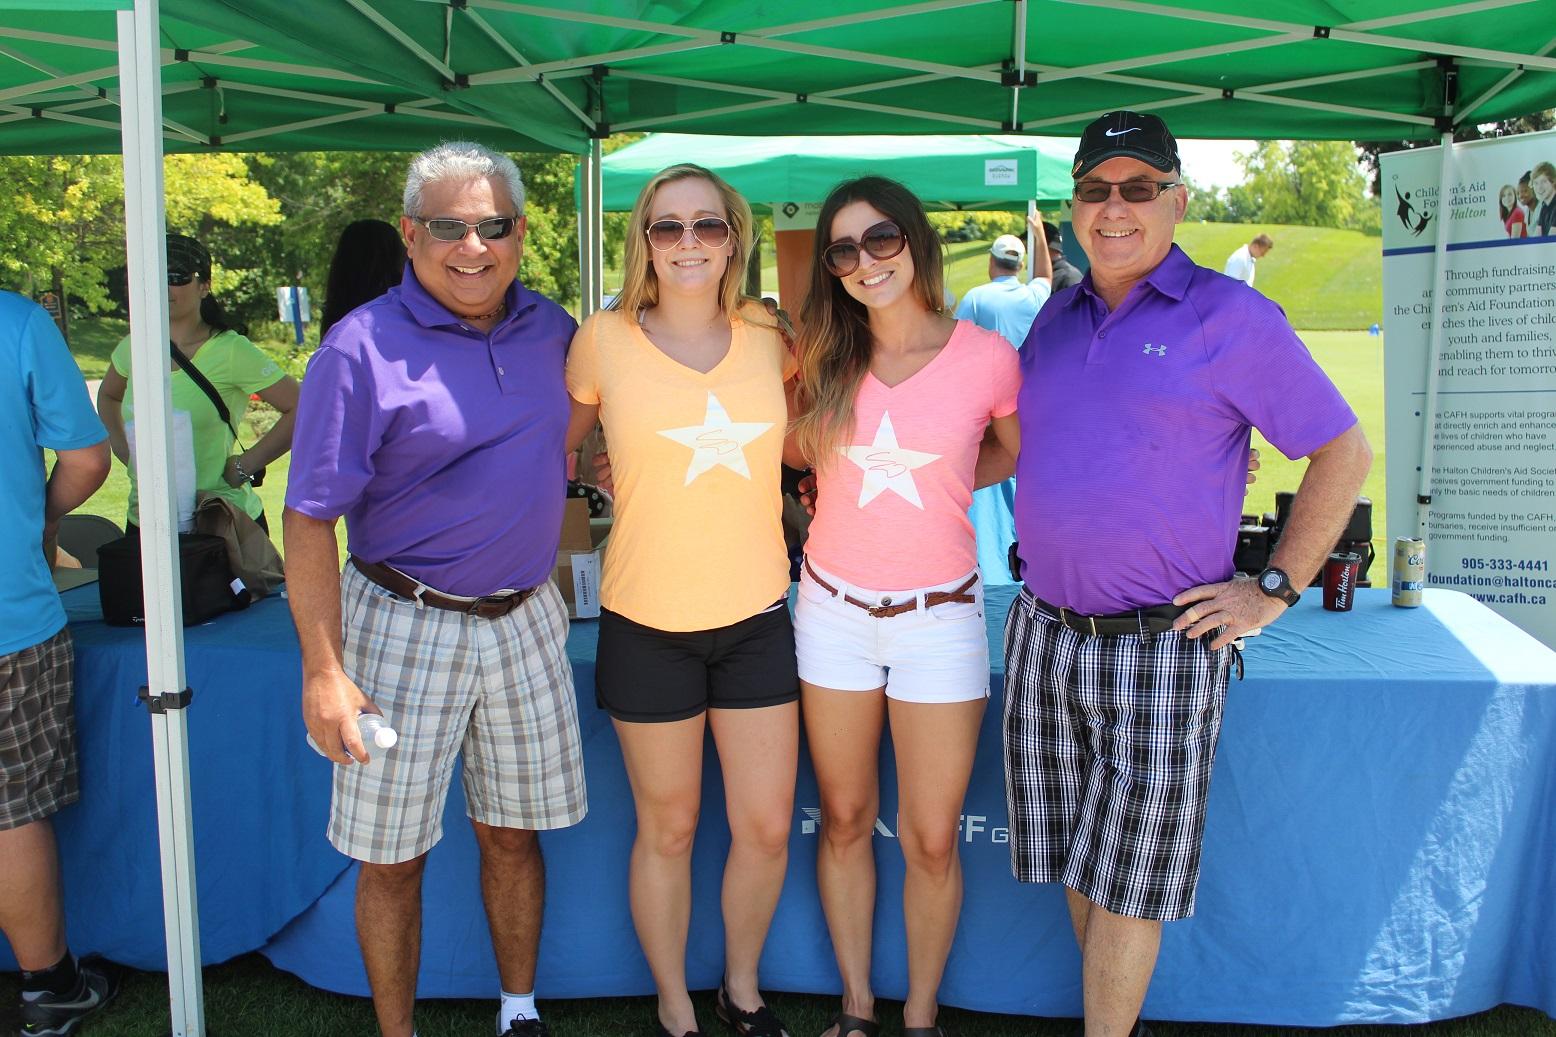 EddieO's Golf guests 17.jpg